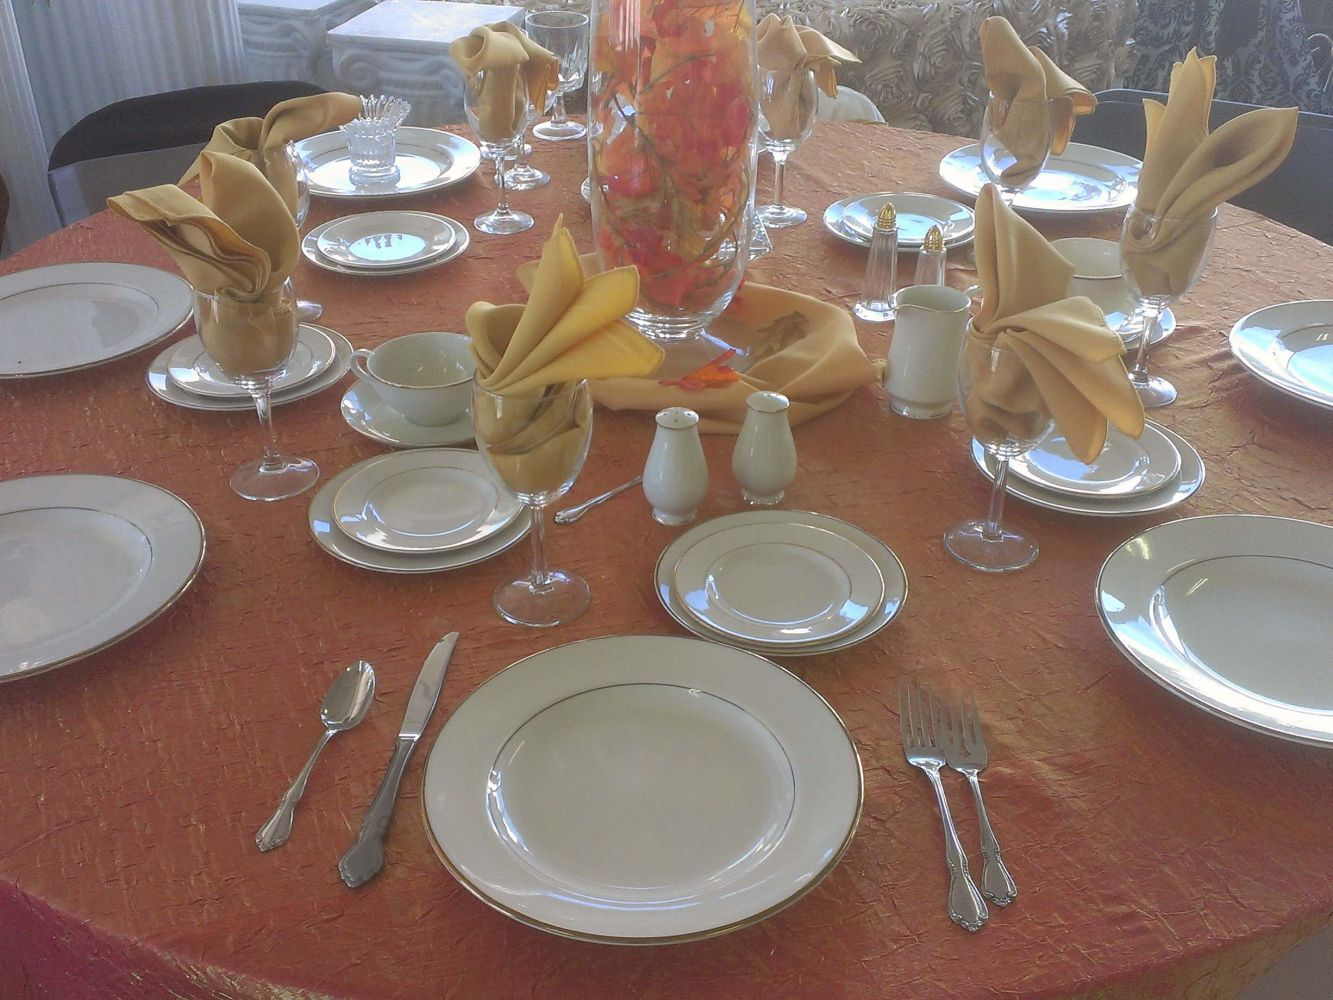 Dinnerware, Flatware, Stemware, Napkins and Linens